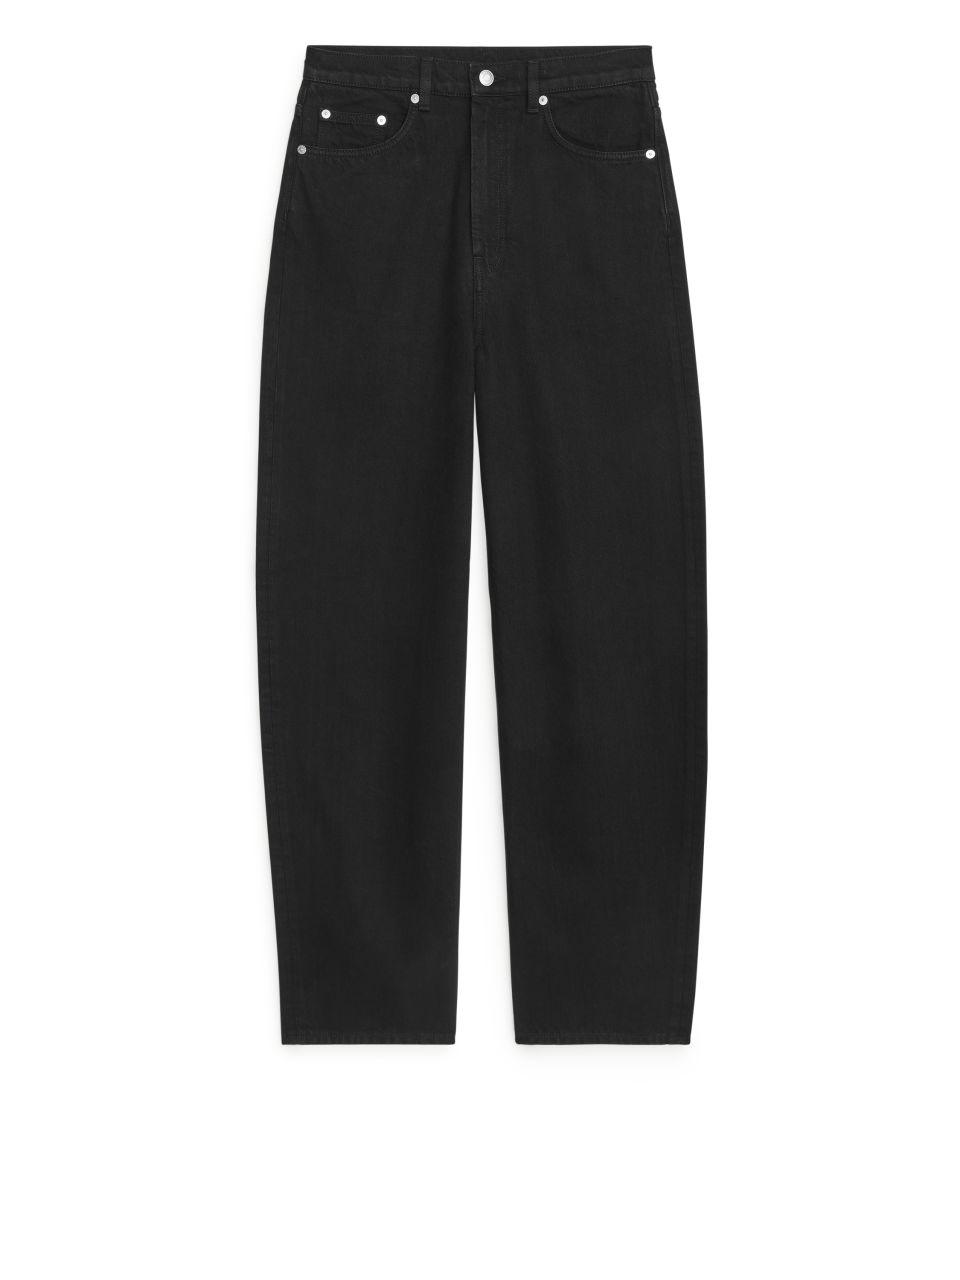 BARREL LEG Jeans - Black